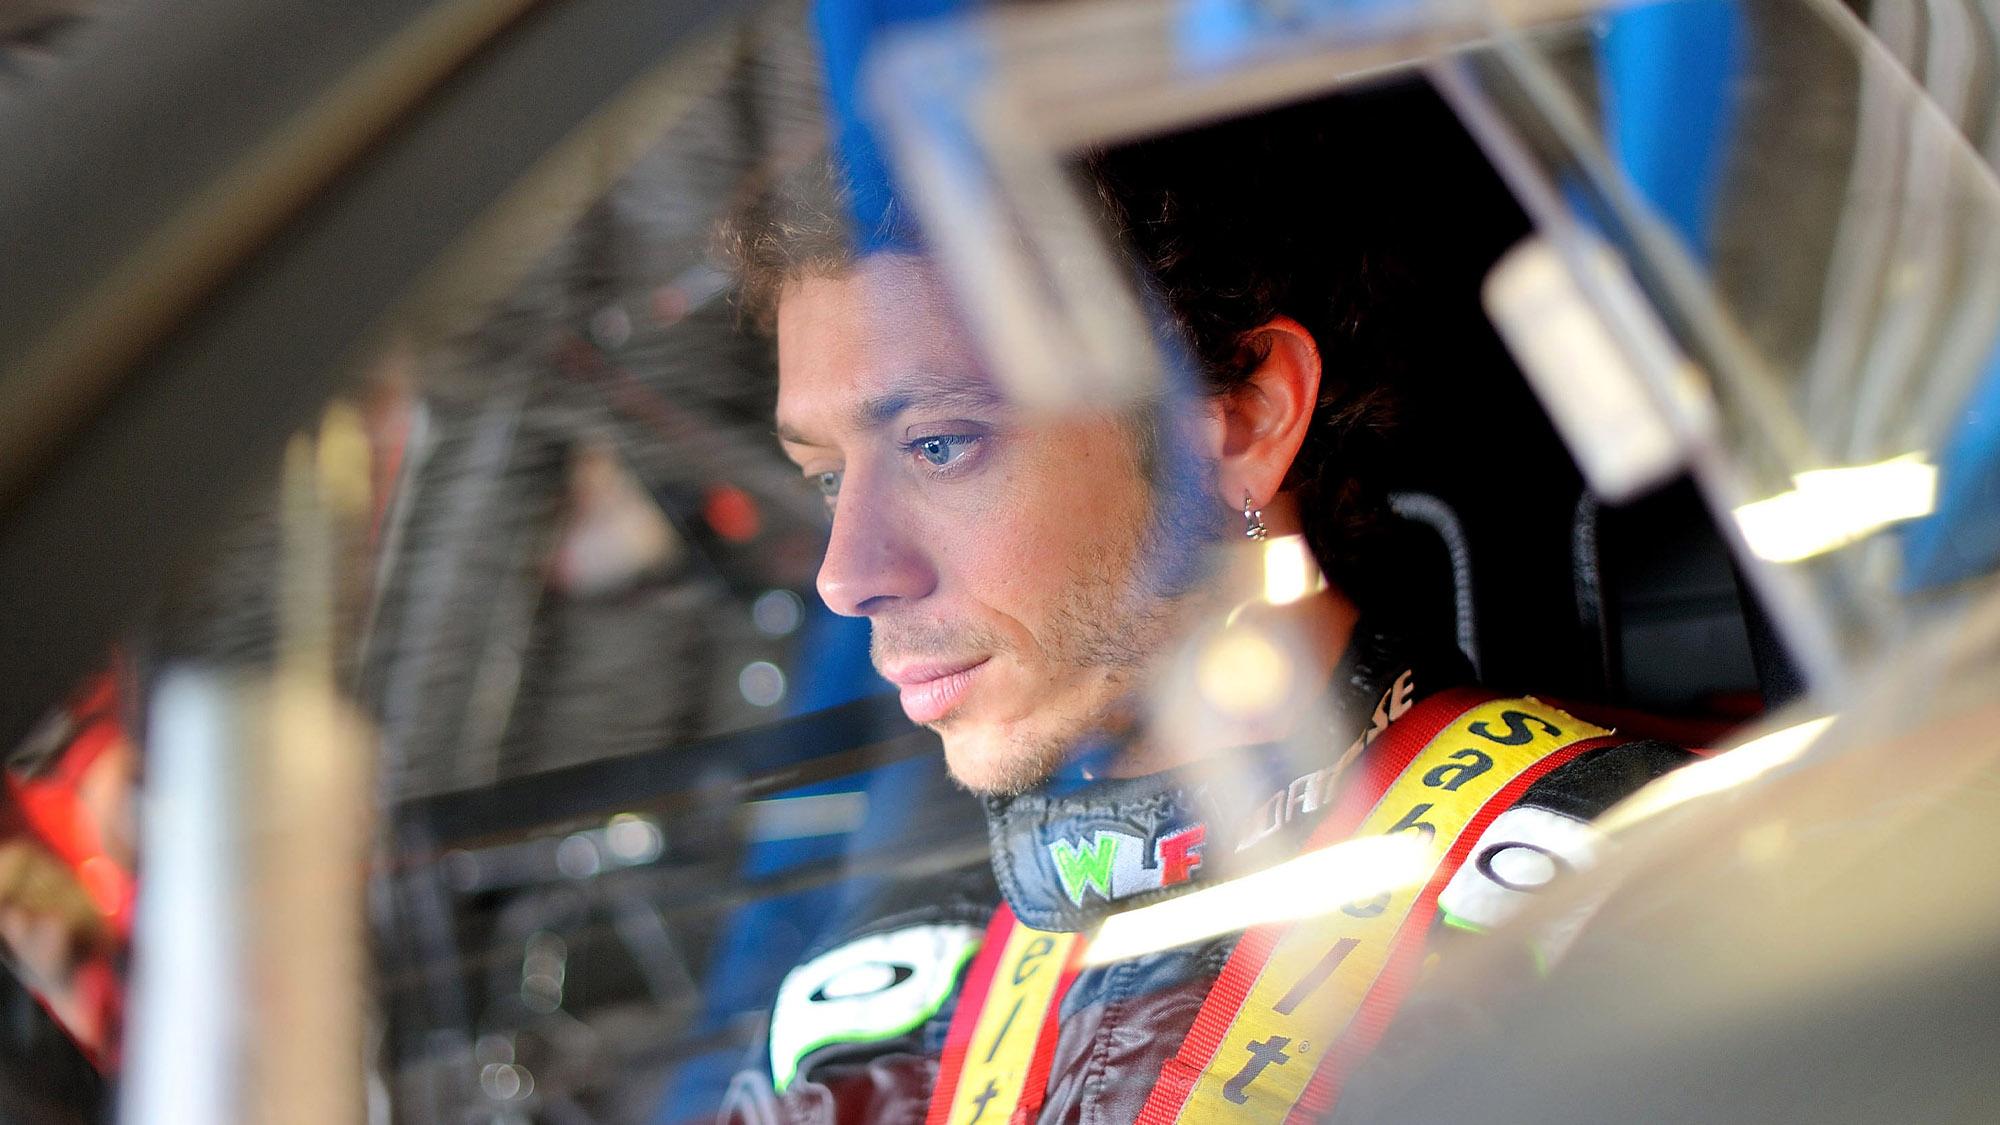 Valentino Rossi testing Blancpain Ednurance car in 2012